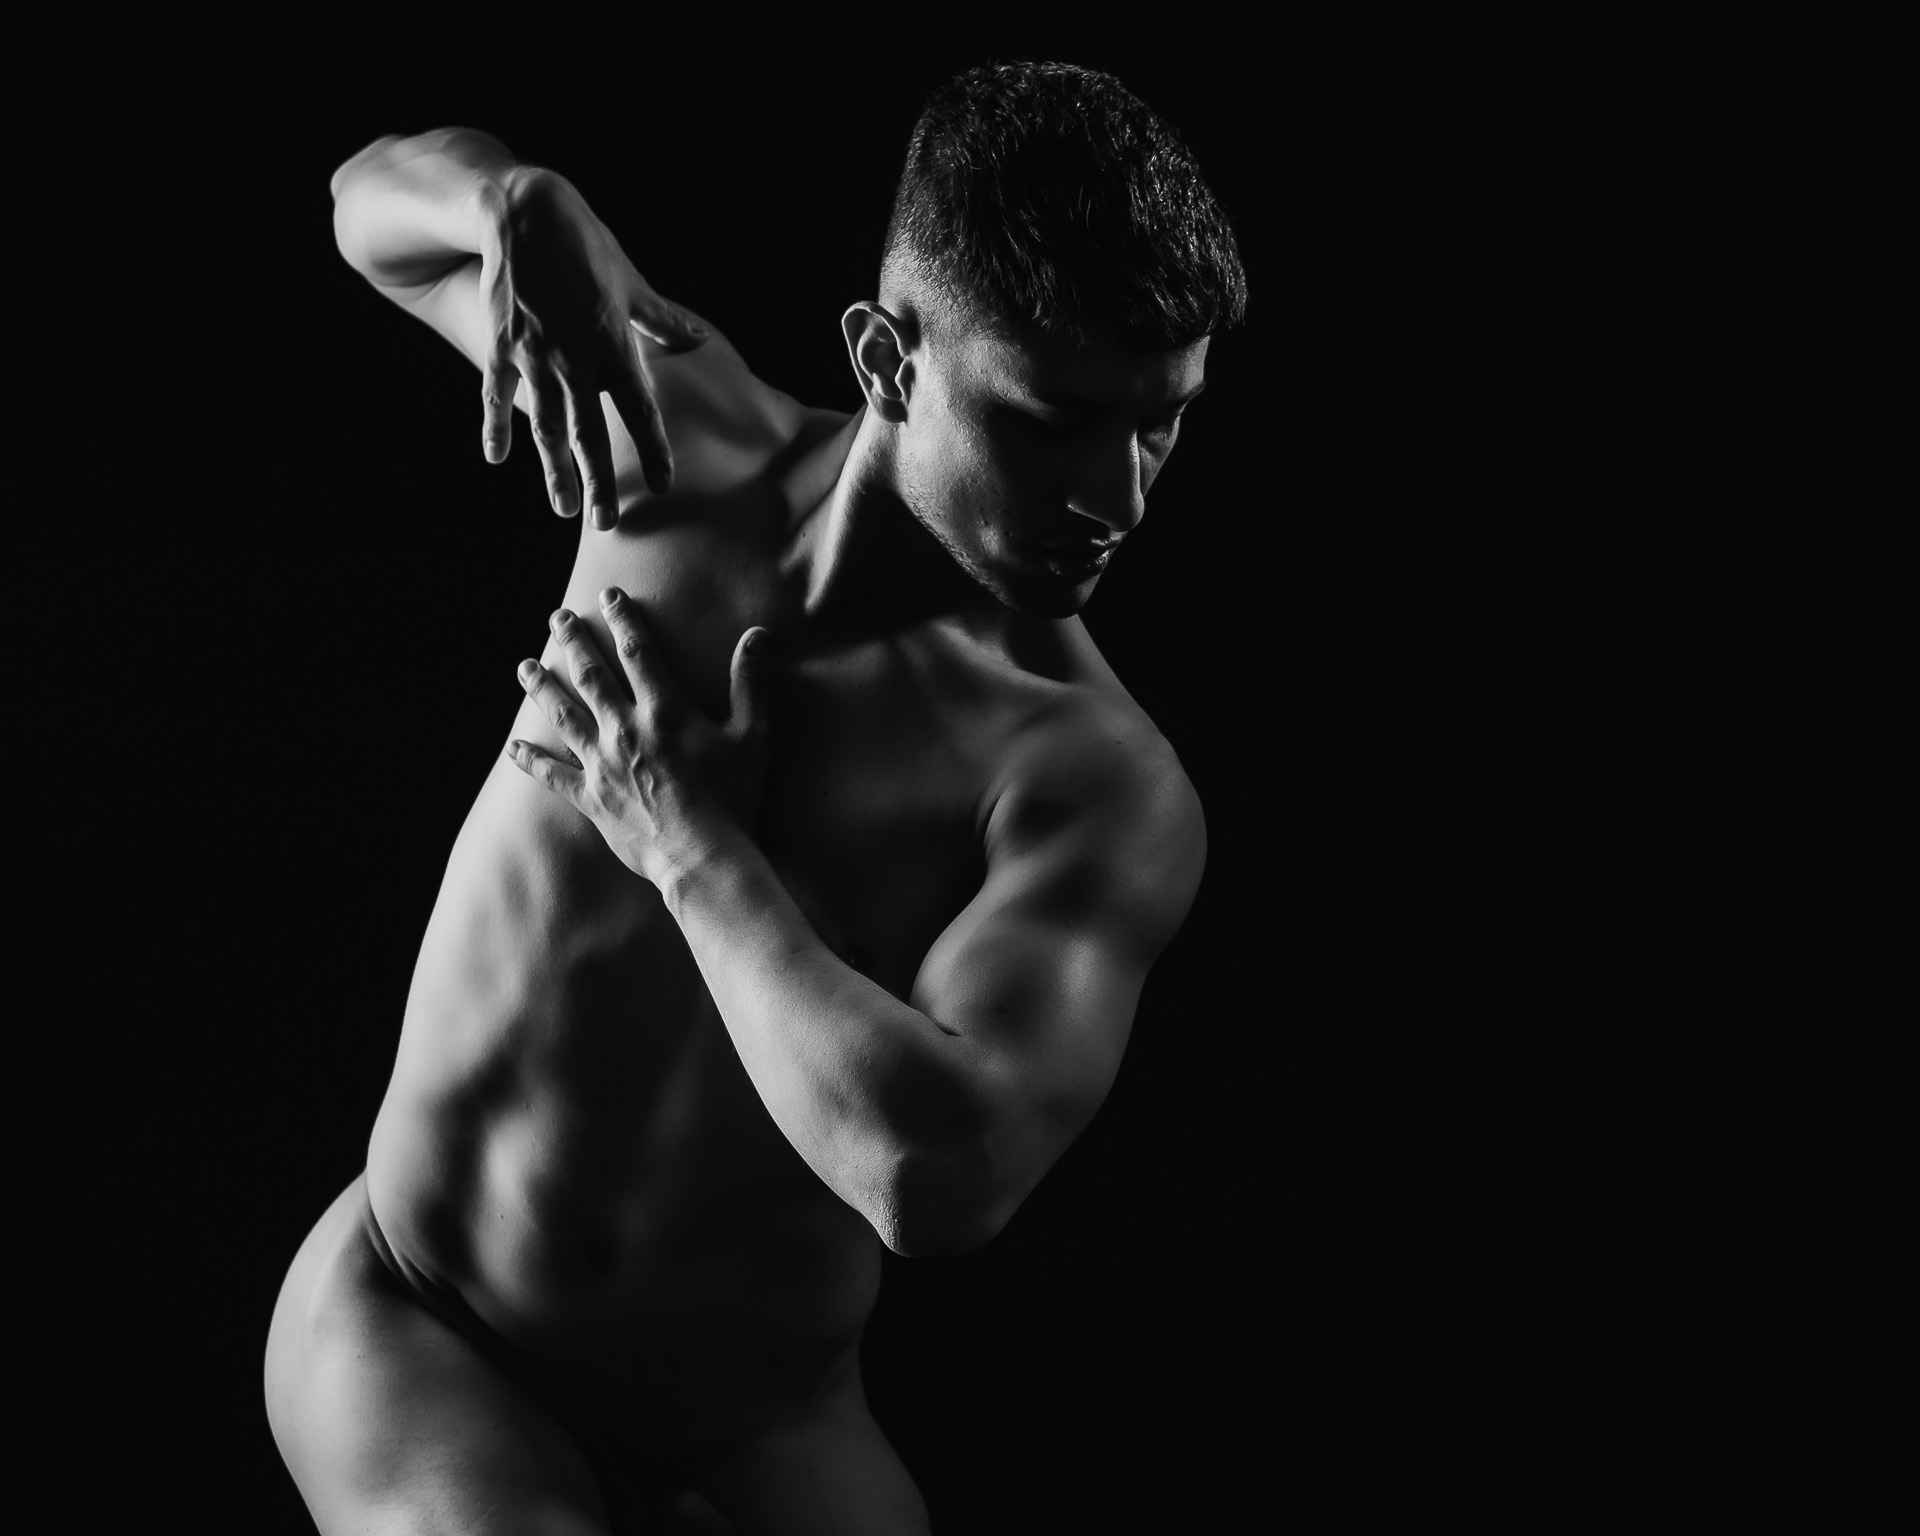 Männeraktfotografie-schwul-gay-photos